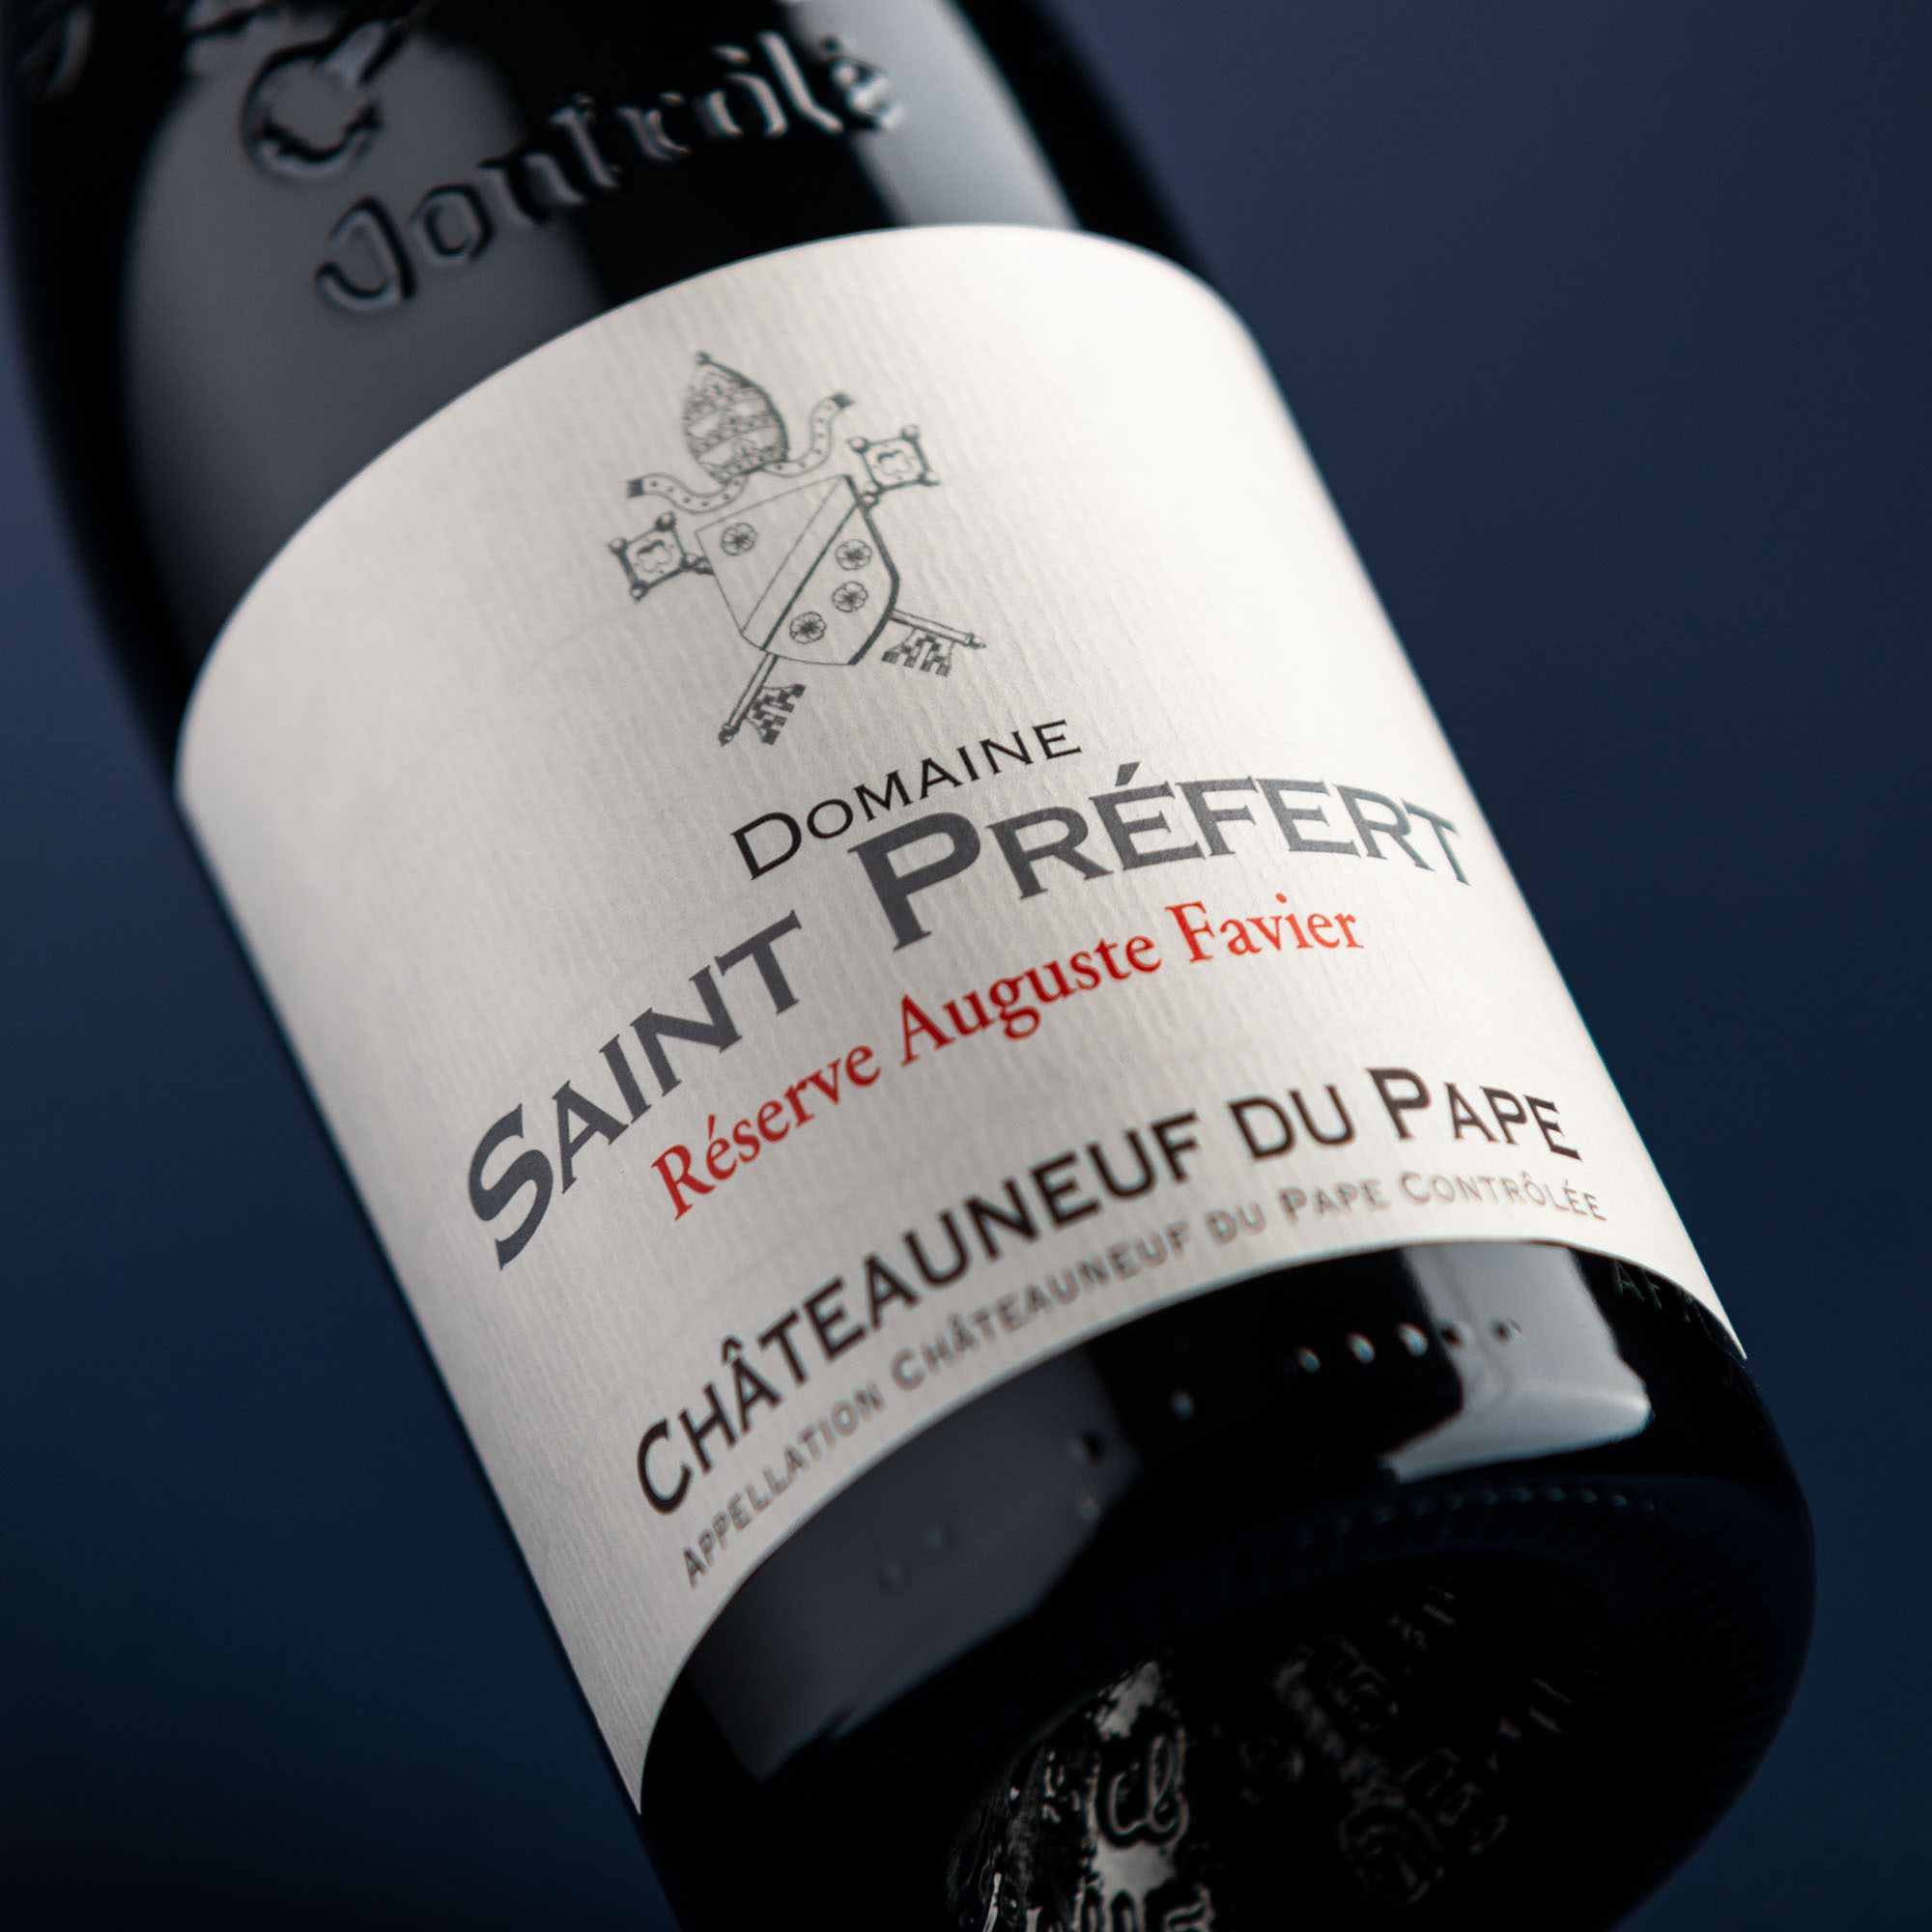 Saint Prefert